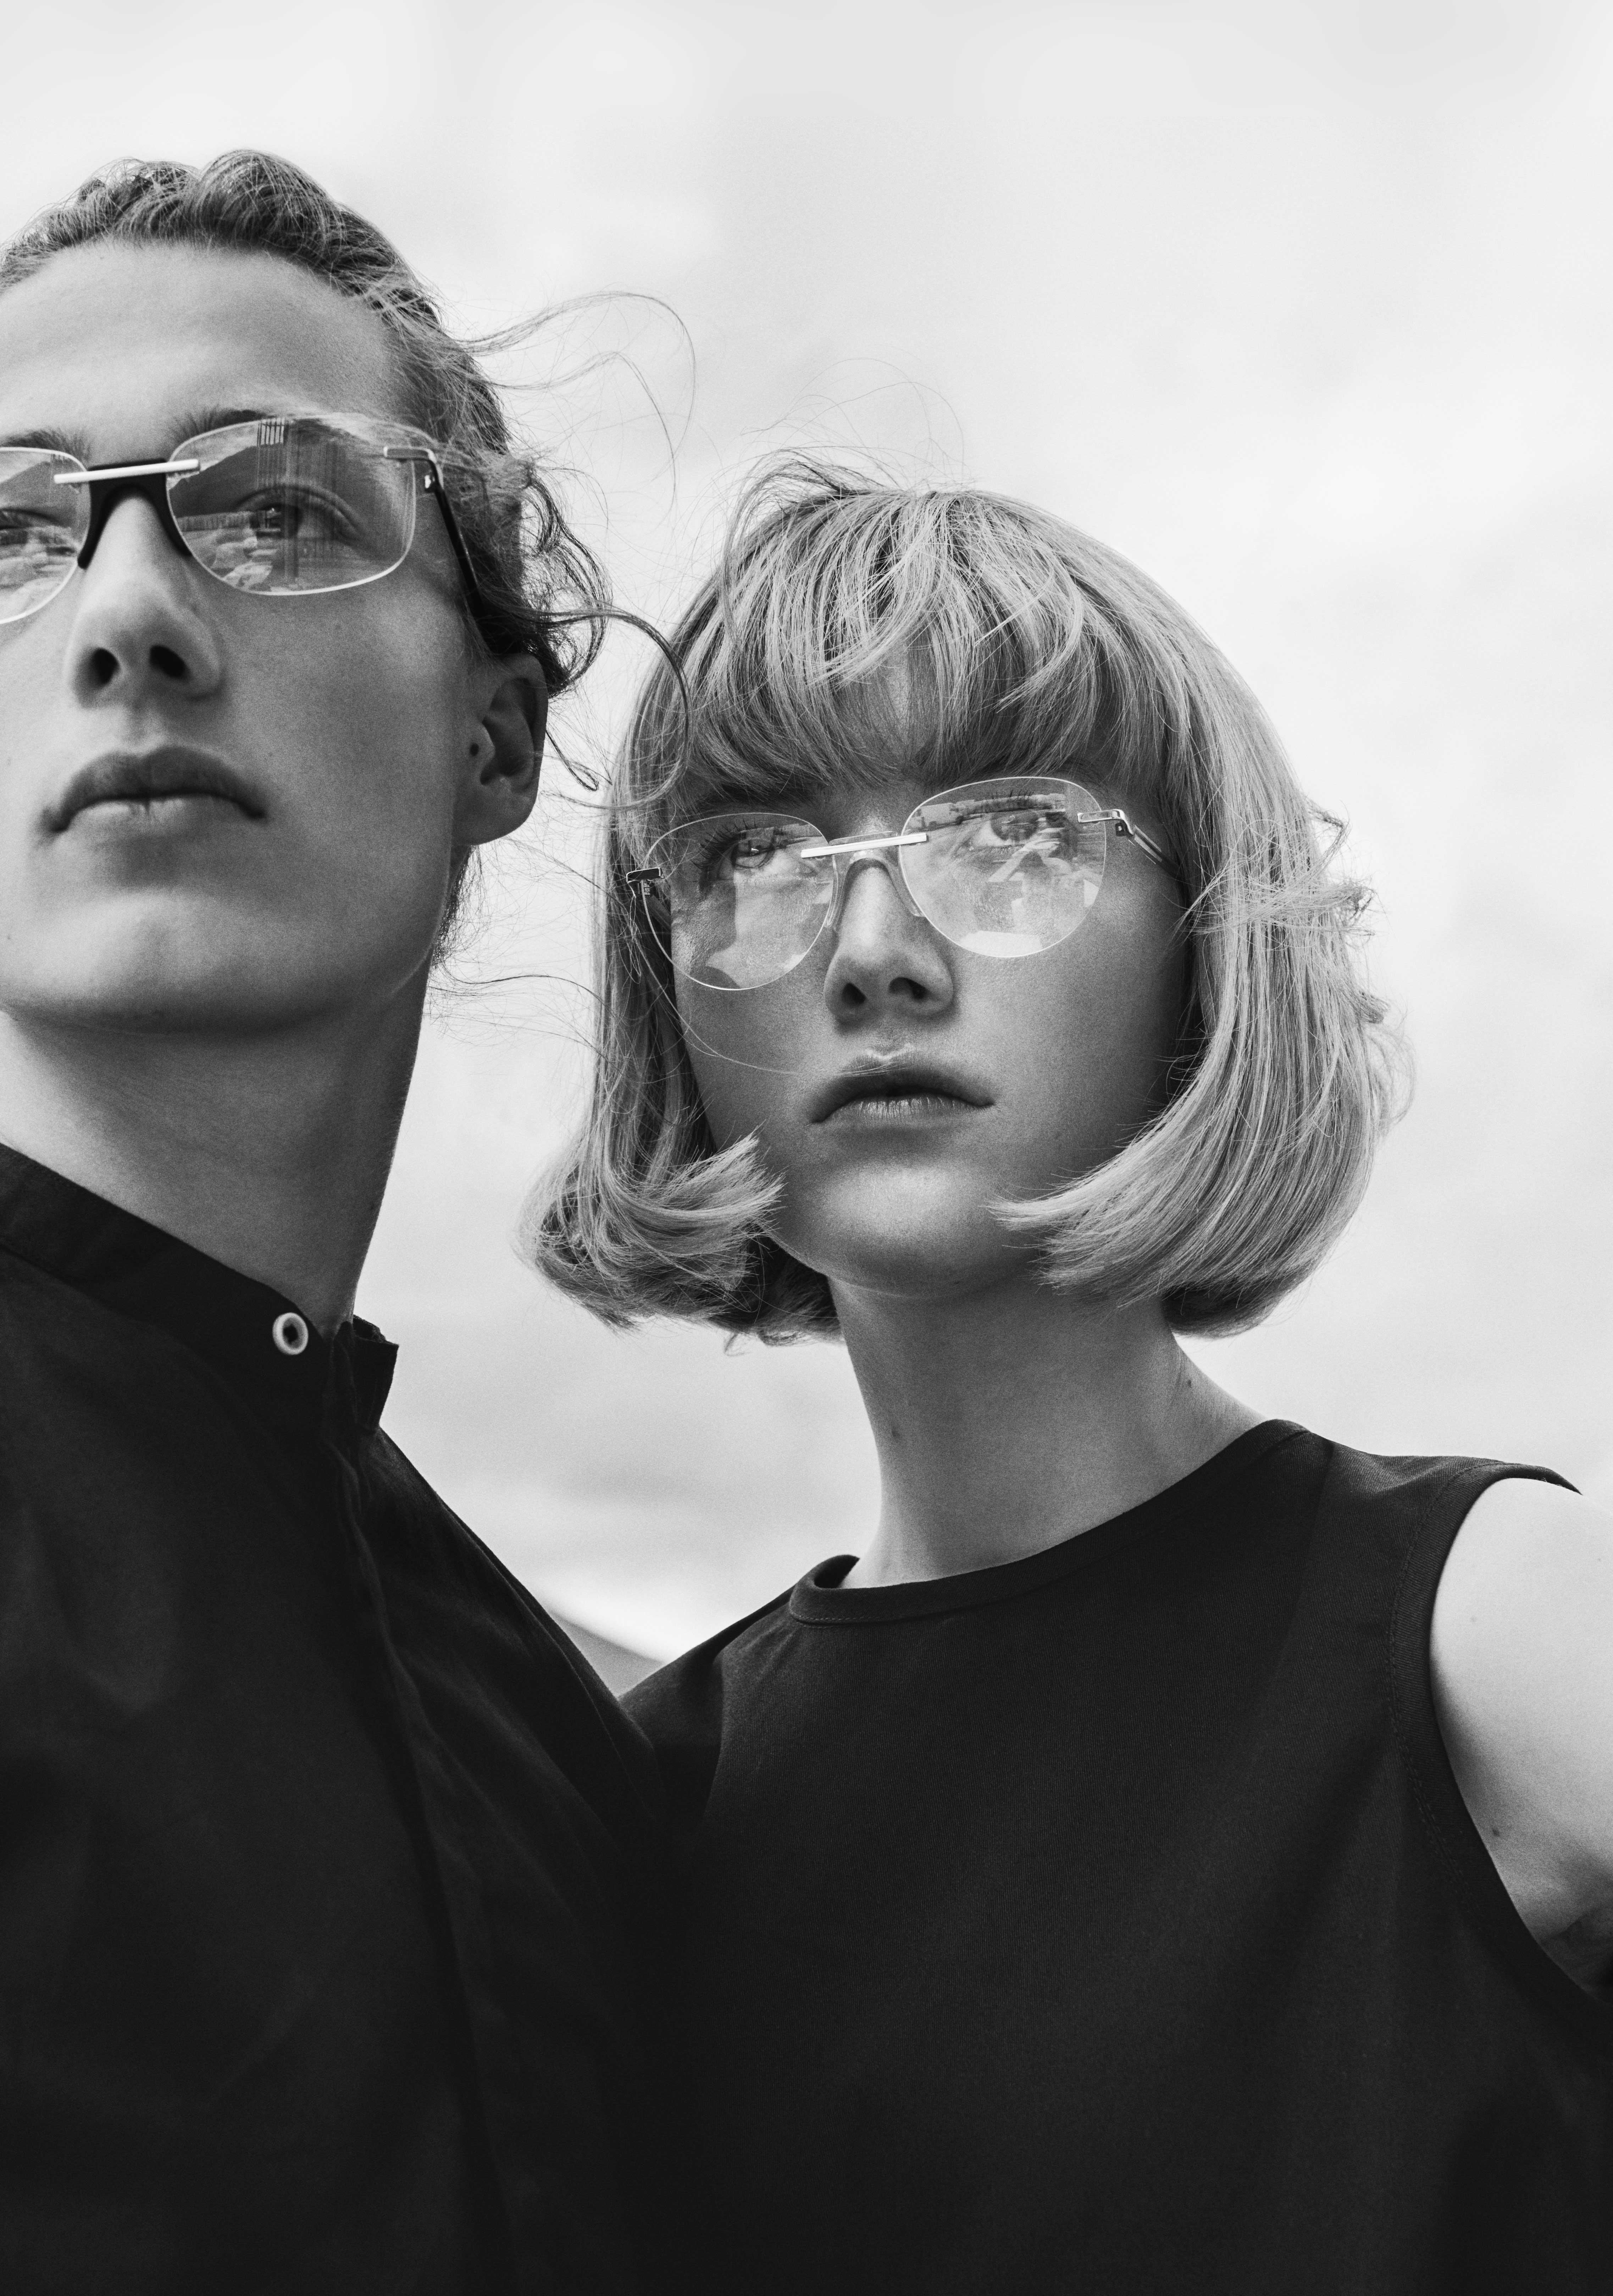 ANDY-WOLF_WHITE-HEAT_Photographer-Elizaveta-Porodina_Model_Nils_Lou-Schoof_Fenn_Gawecki